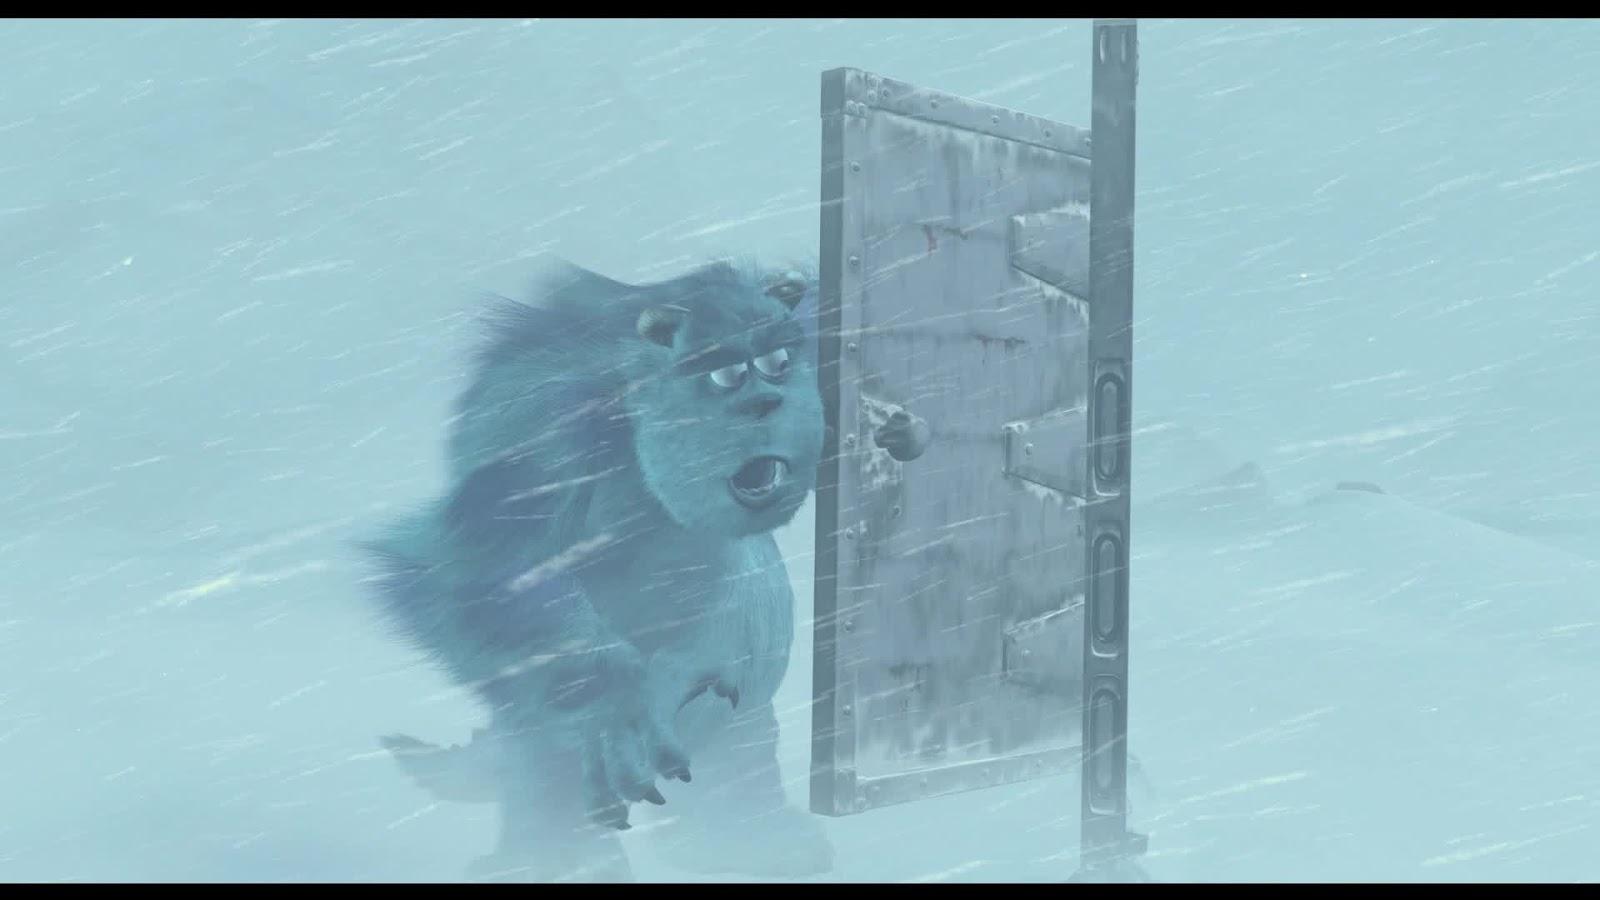 Yeti Snowman Himalayas